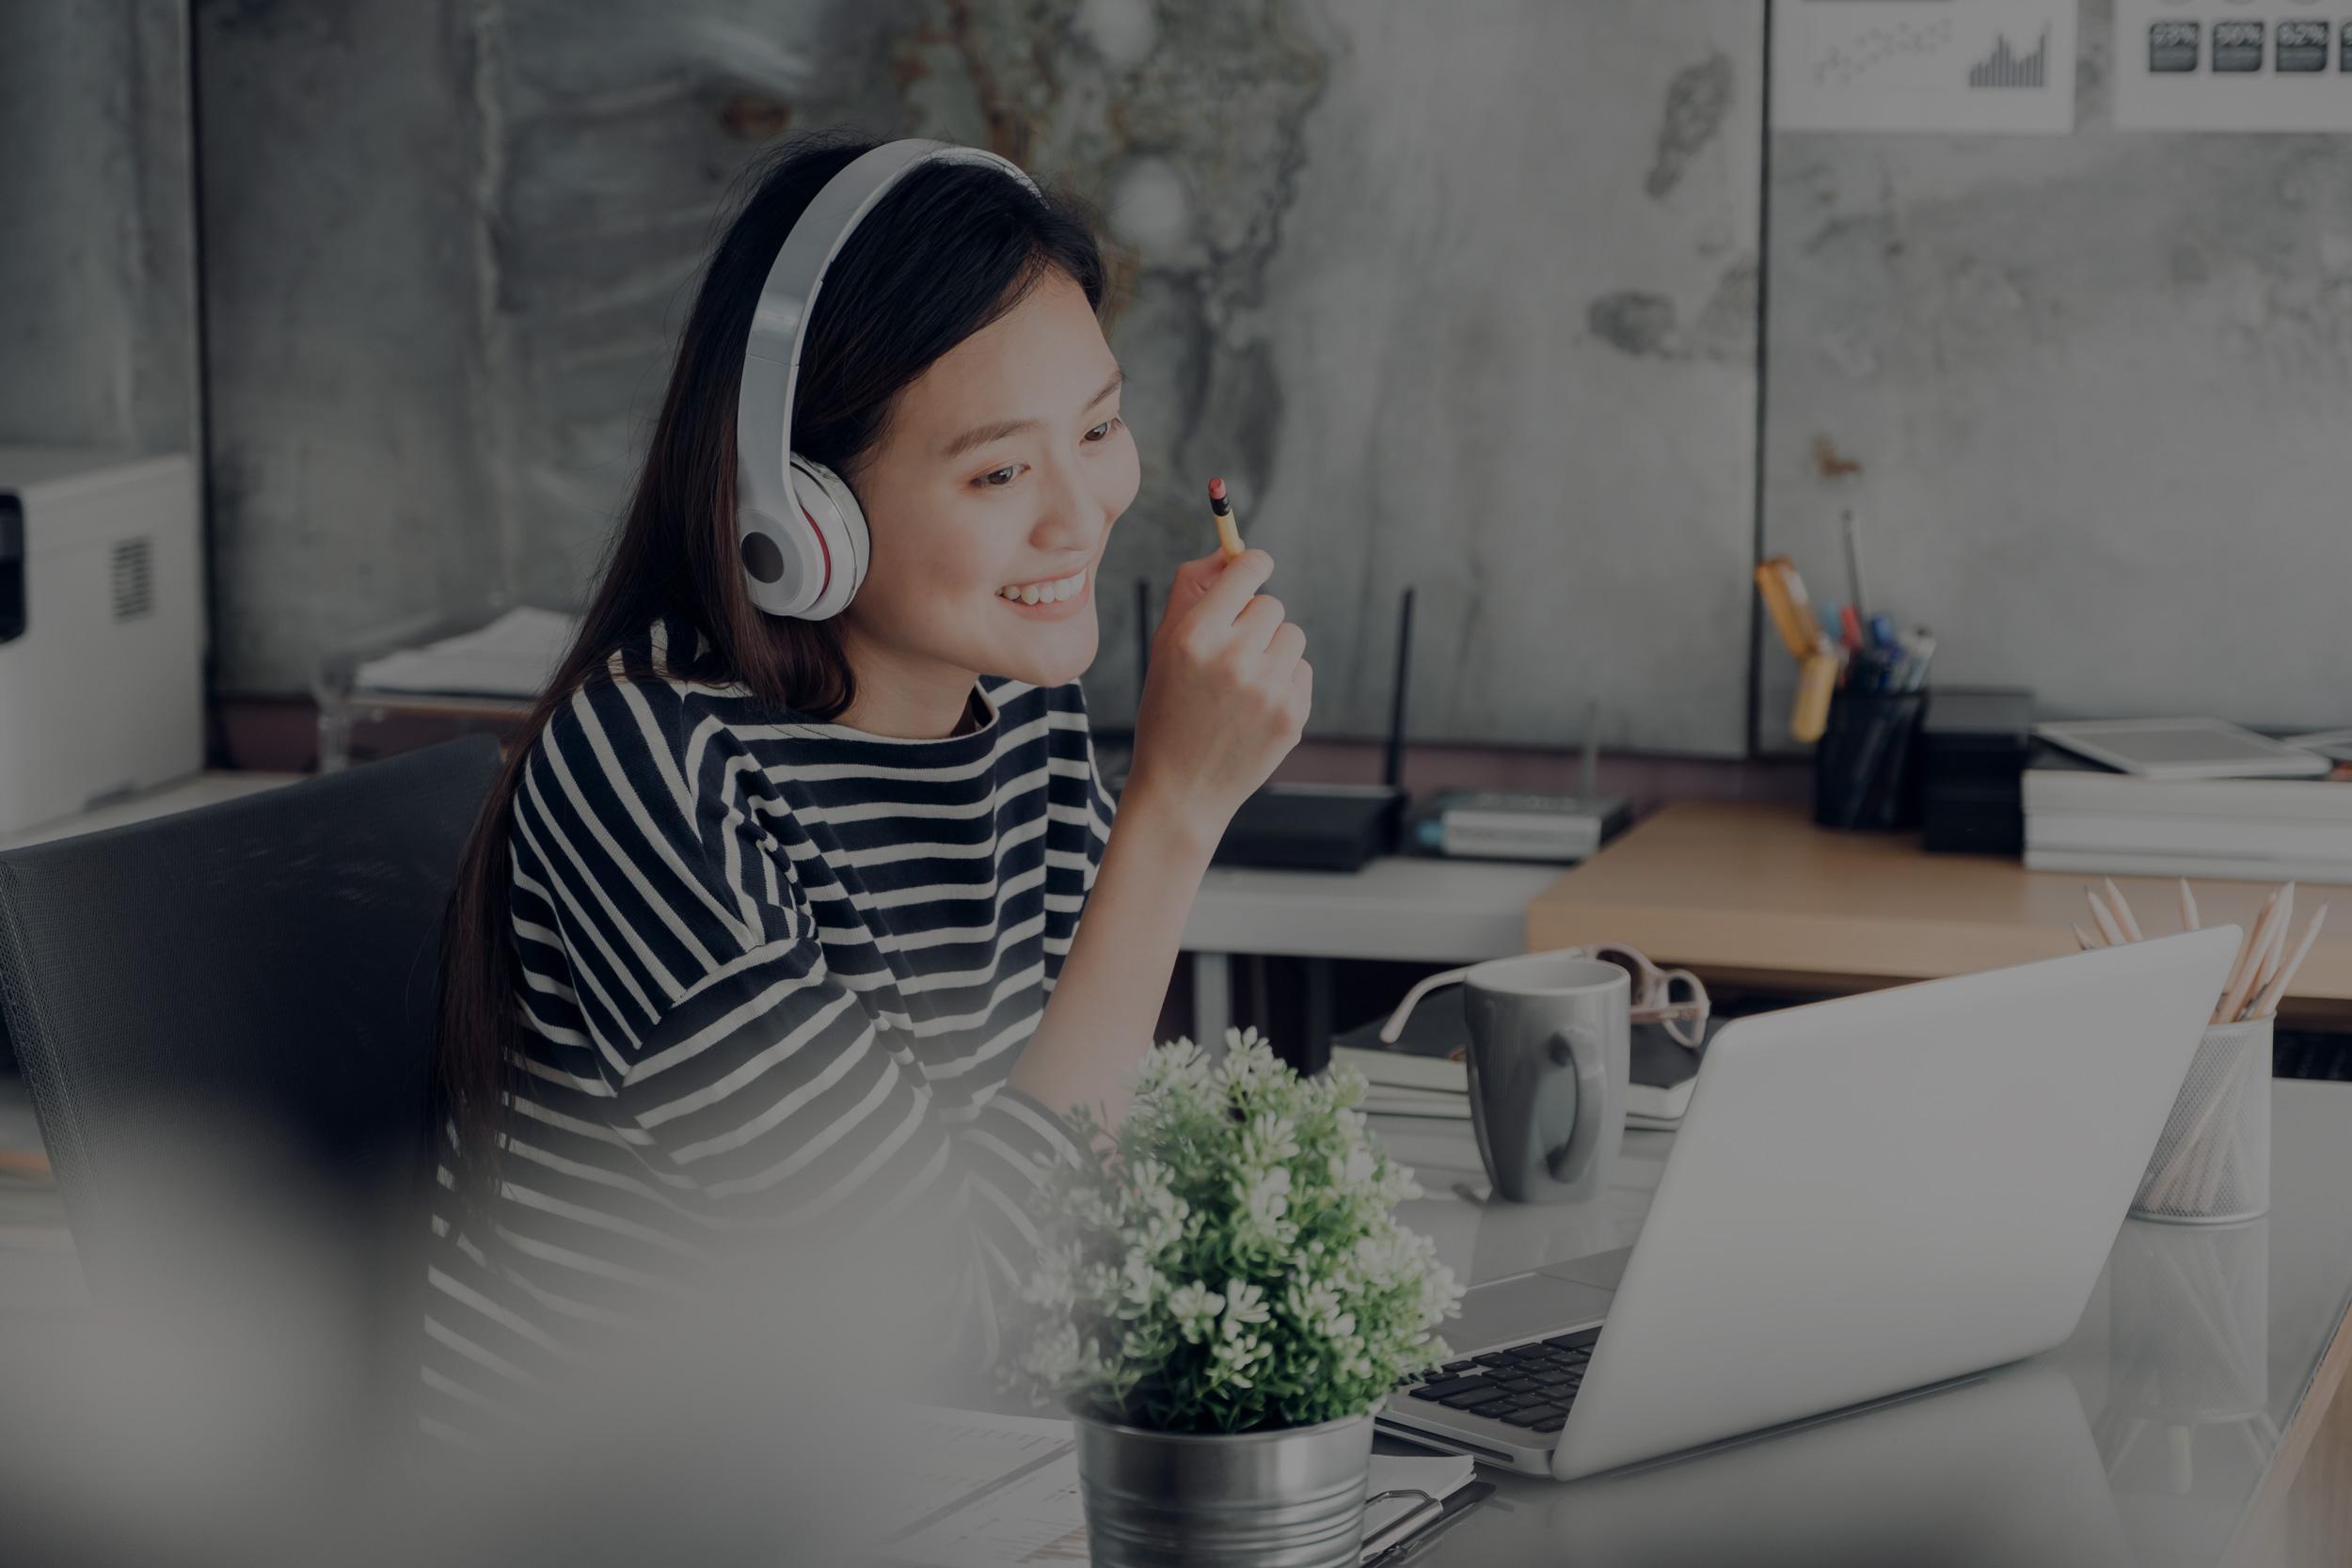 cloud-based hospitality technology